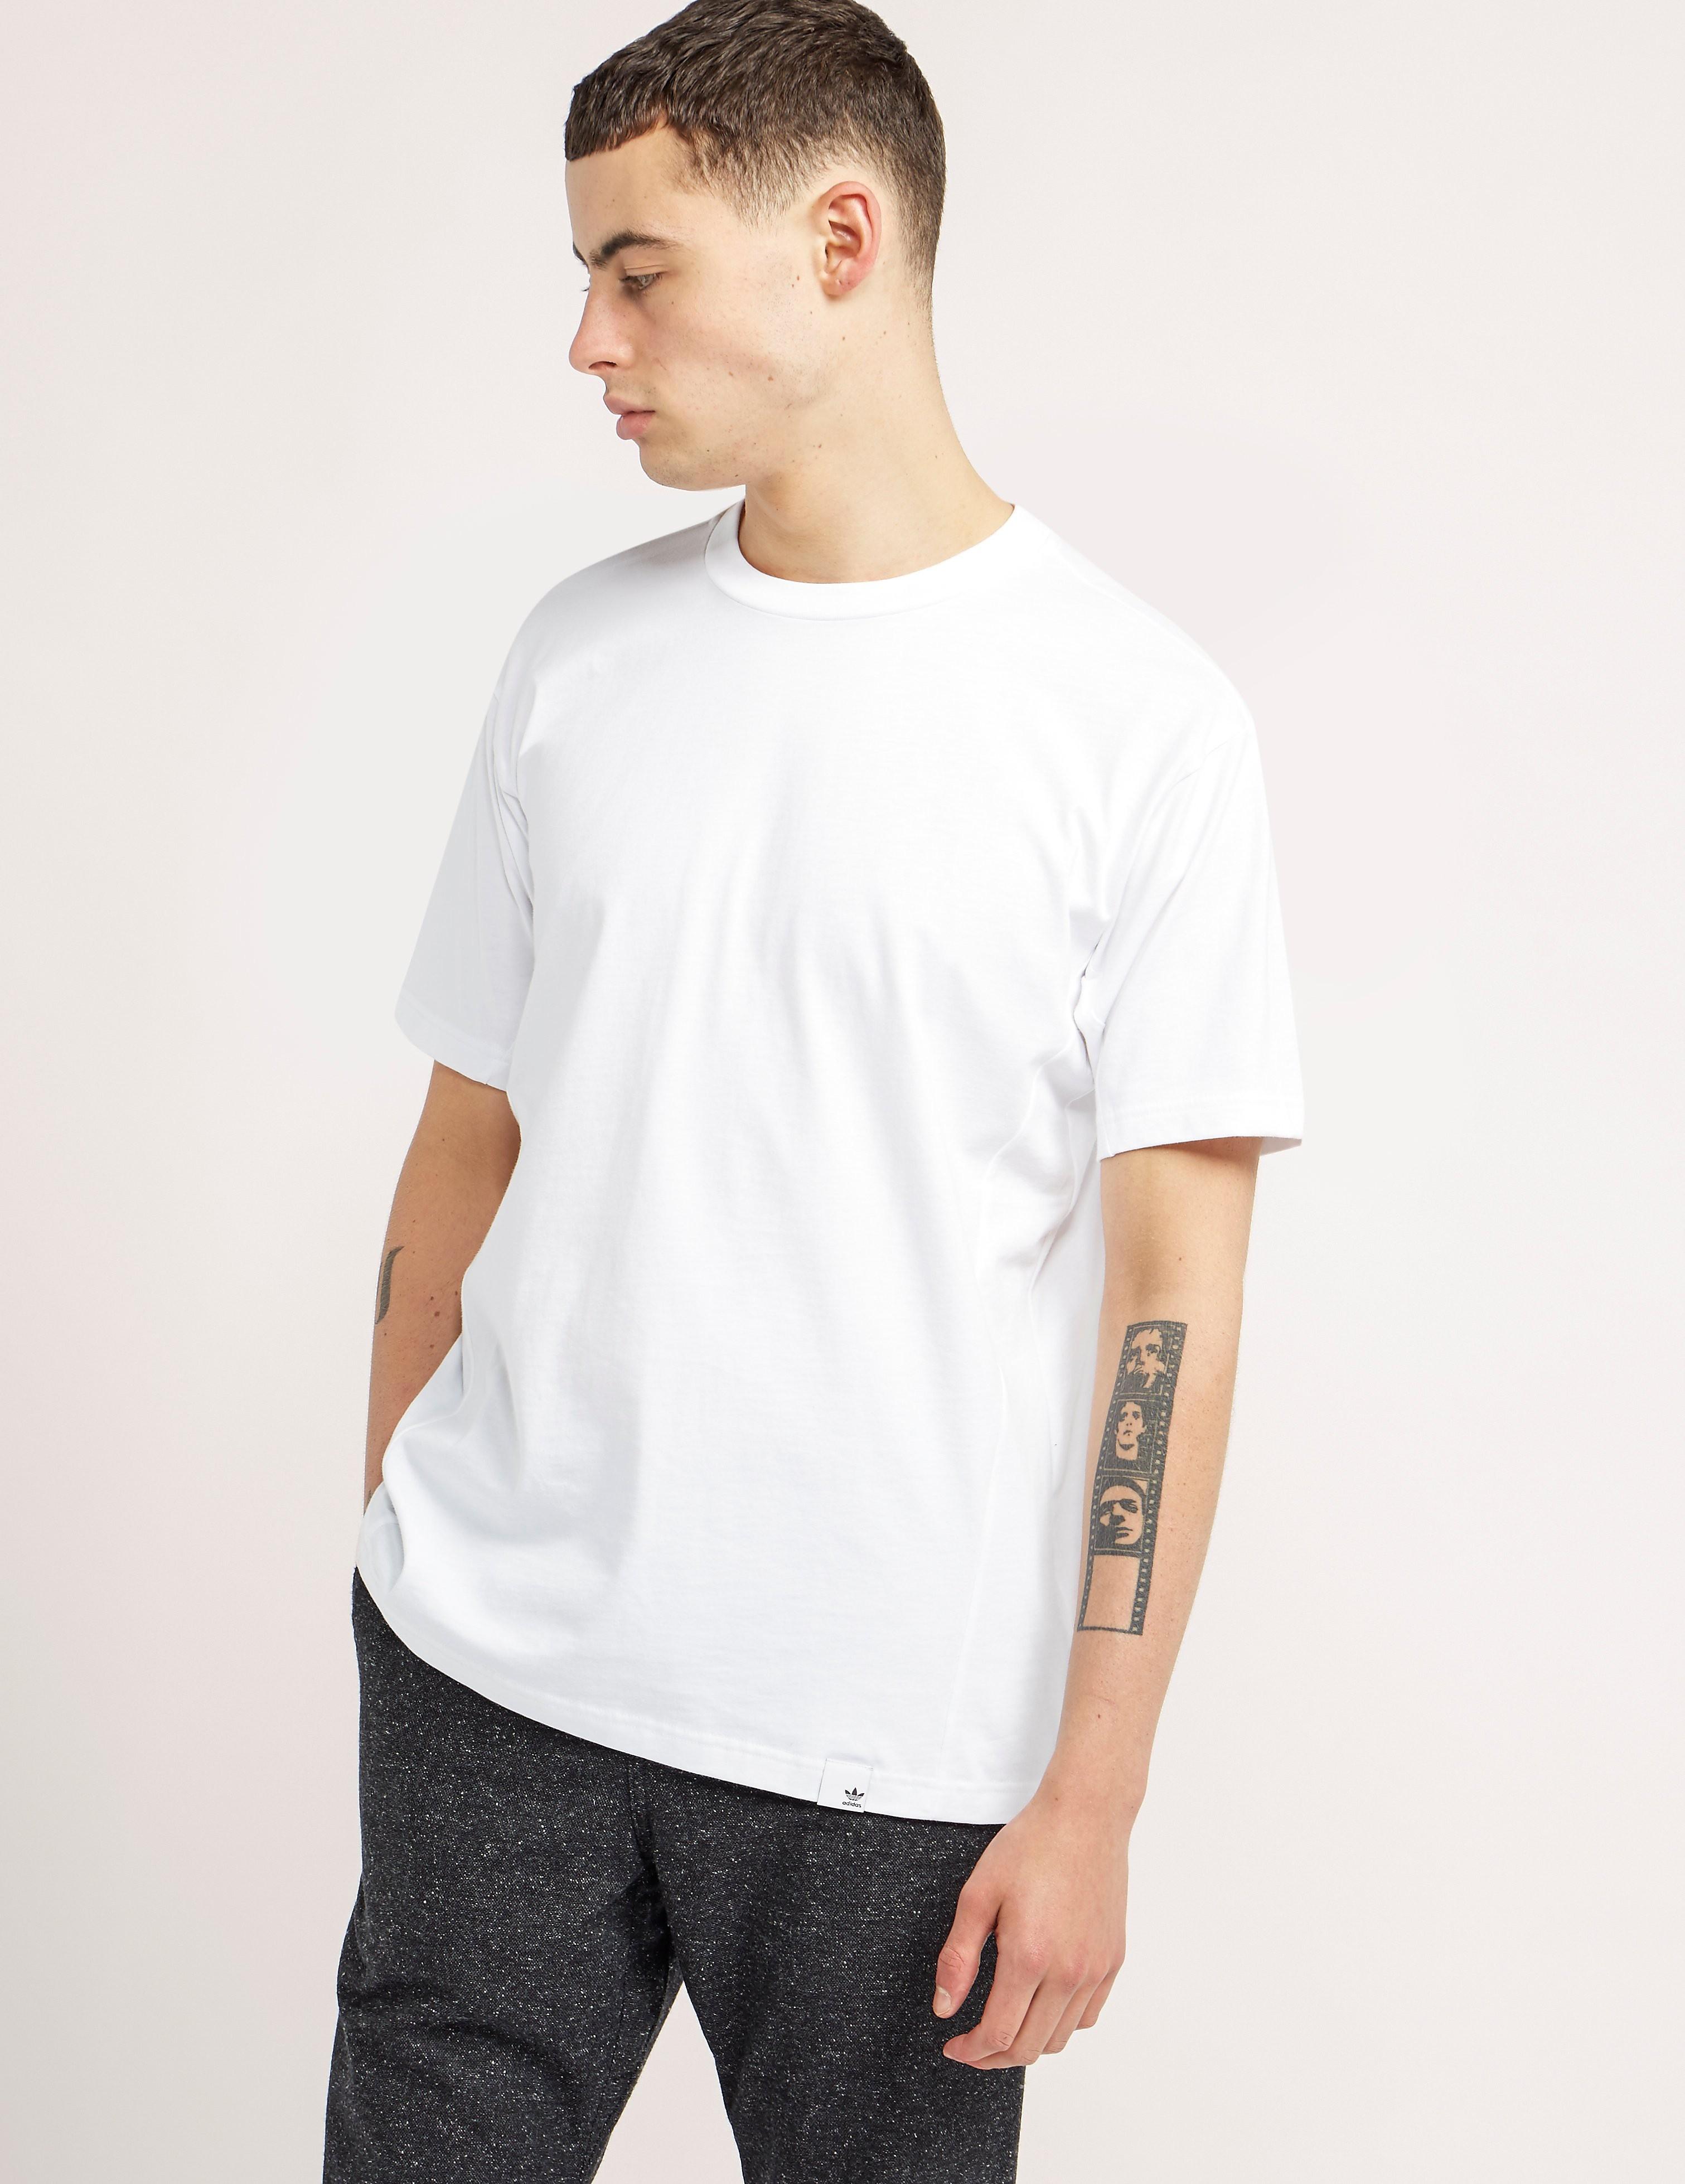 adidas Originals XBYO Crew Short Sleeve T-Shirt